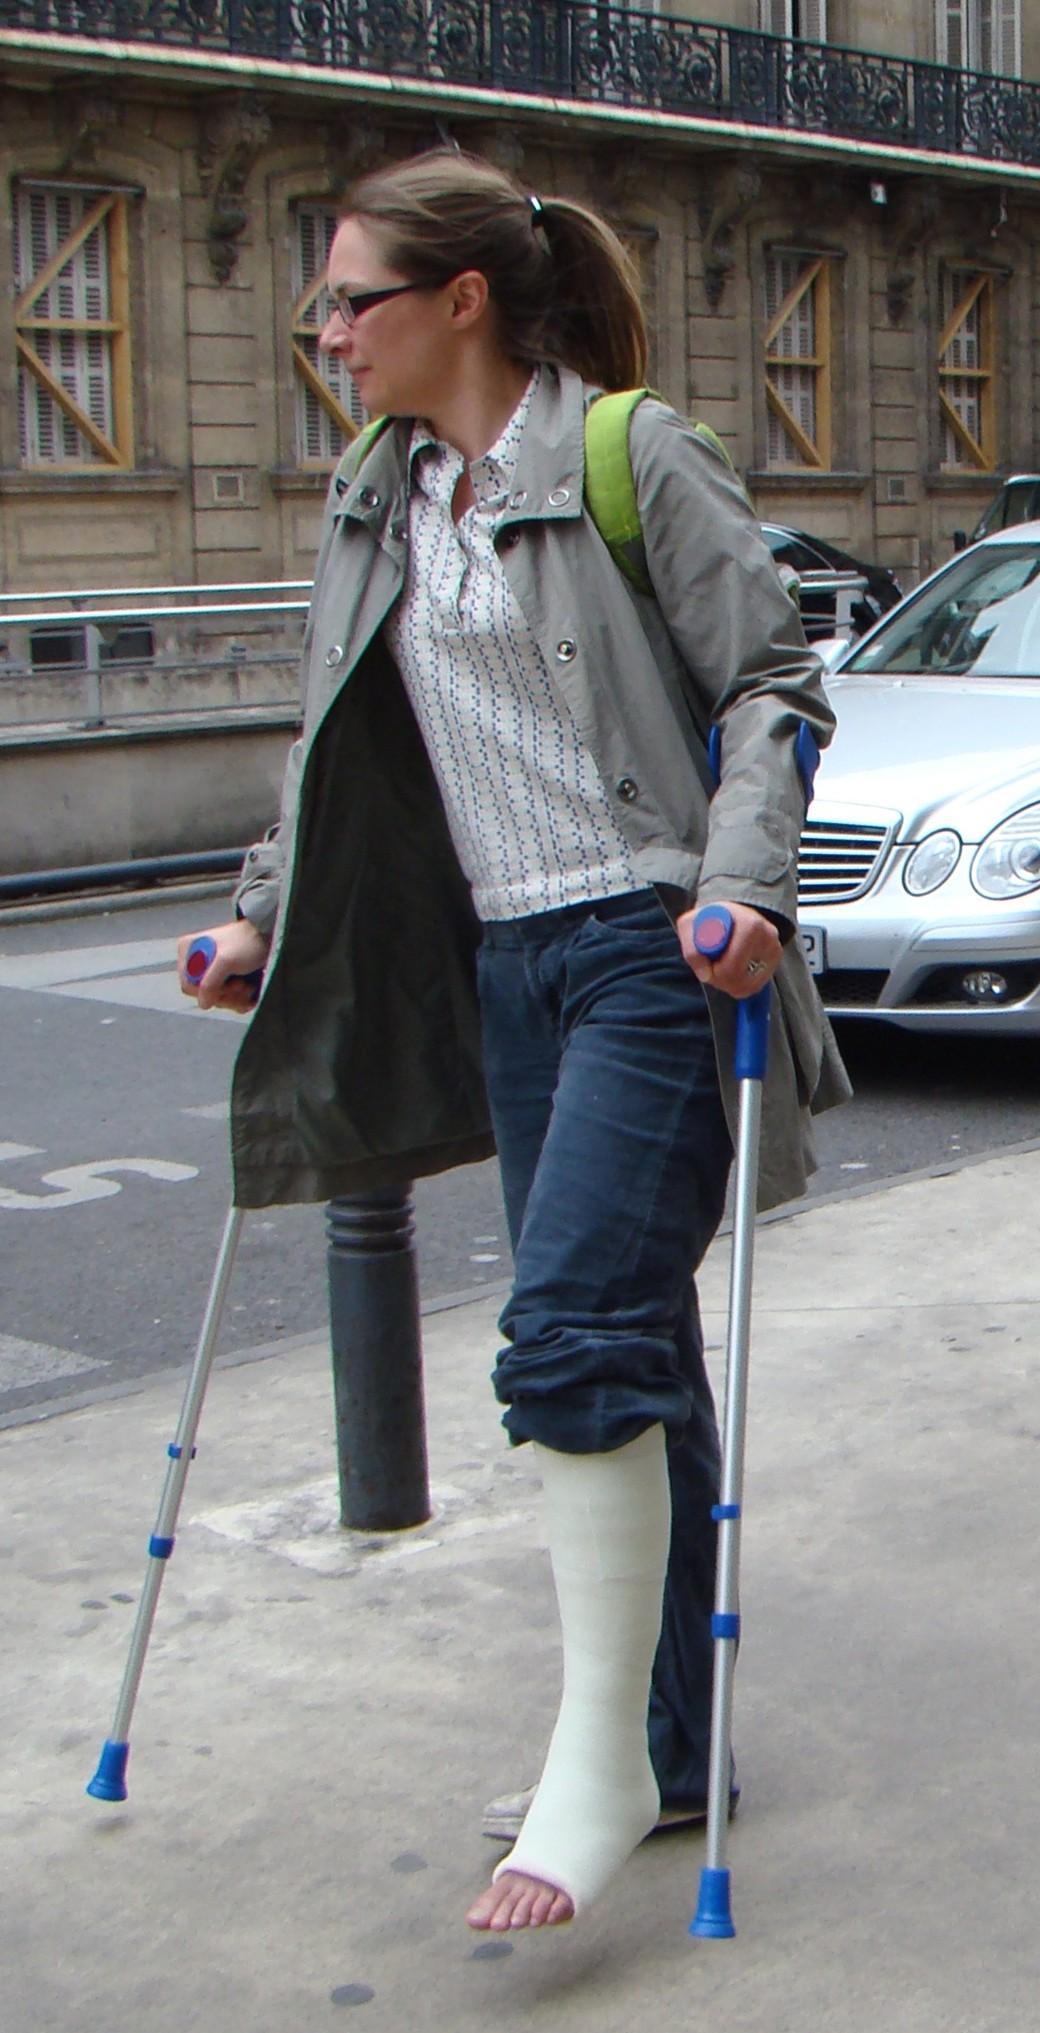 Woman with short leg fibre cast and crutches